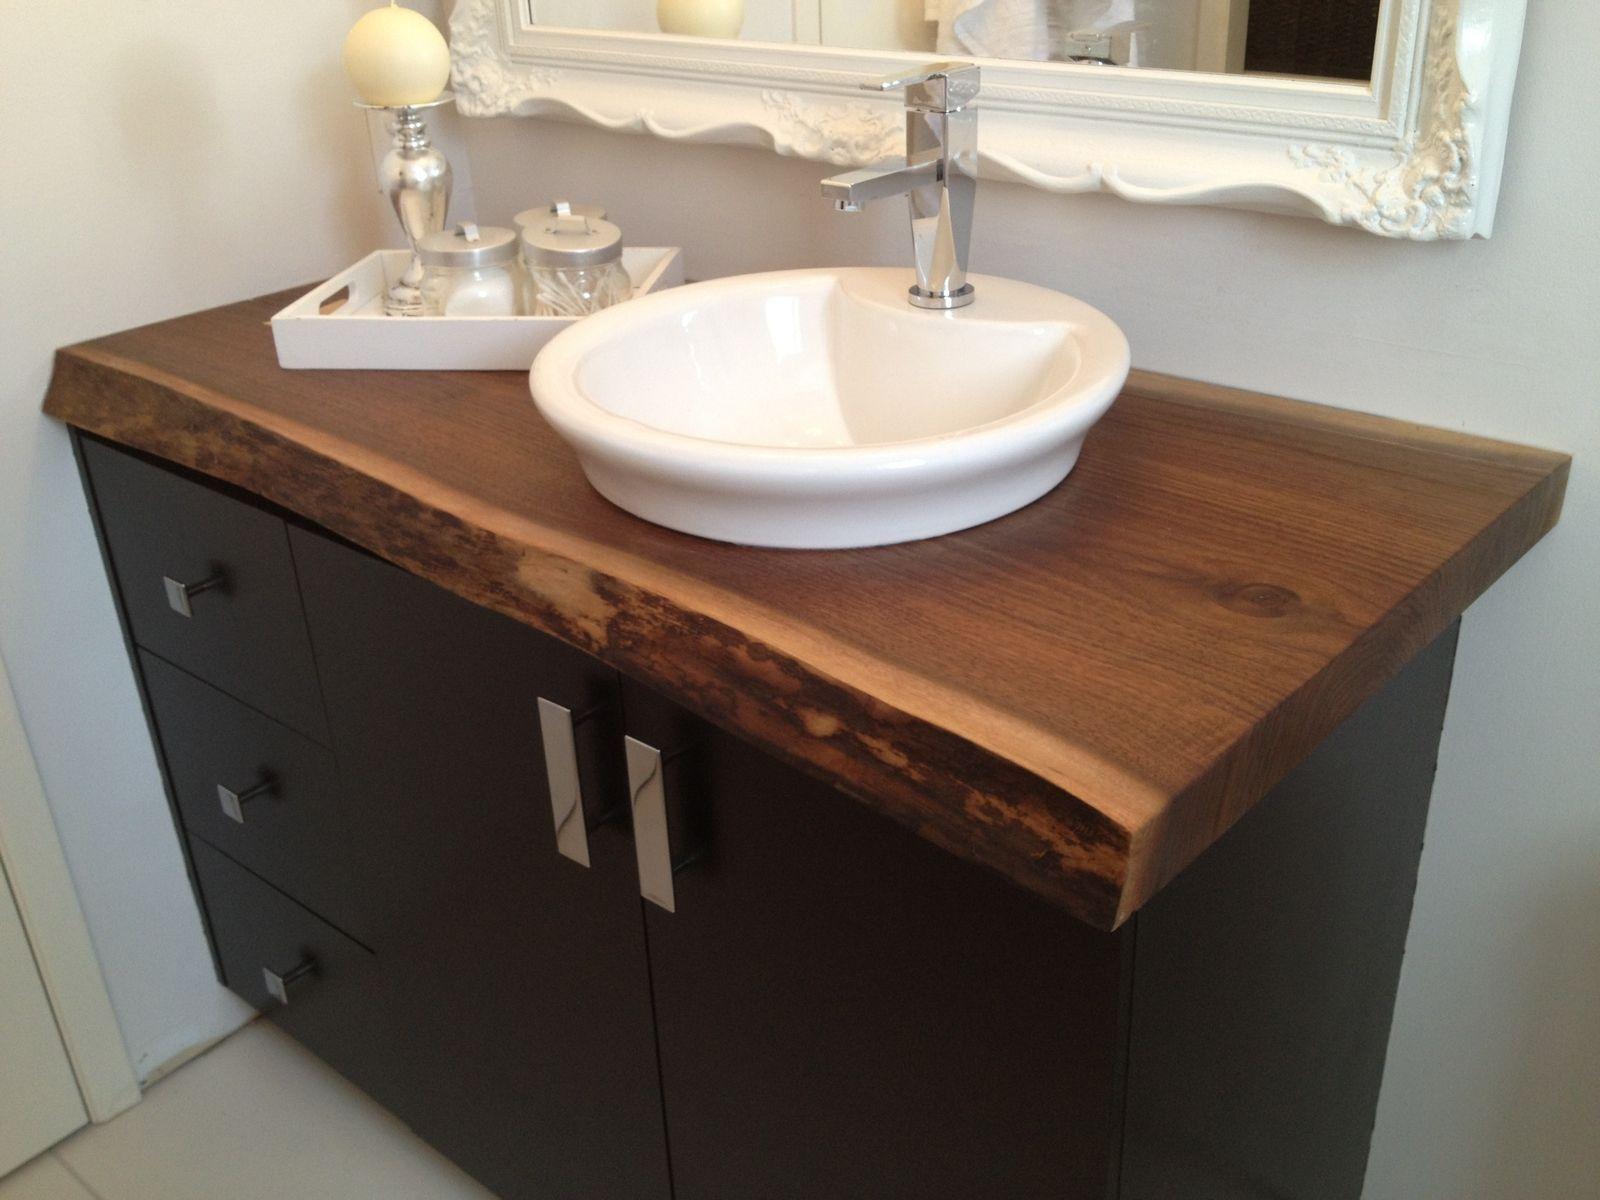 Hand Made Live Edge Black Walnut Bathroom Countertop By Bois Wooden Bathroom Diy Bathroom Vanity Wood Countertop Bathroom